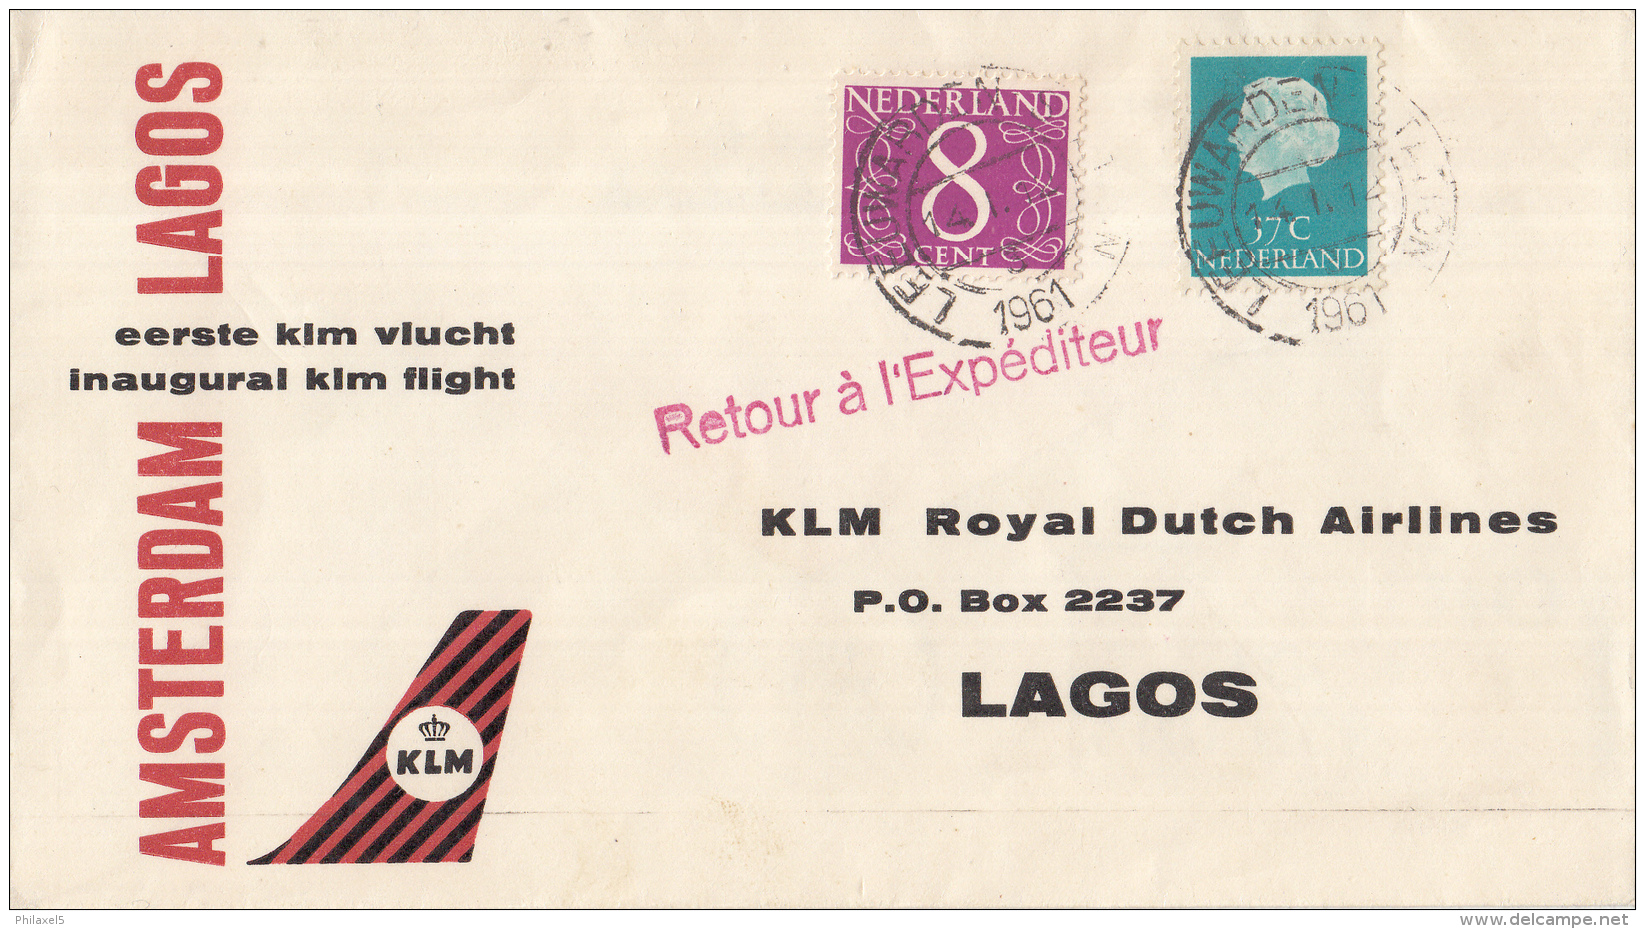 Nederland - 1ste Vlucht - 17 Januari 1961 - Amsterdam-Lagos - Vl. Hol. 570 I - Marcofilie - EMA (Print Machine)